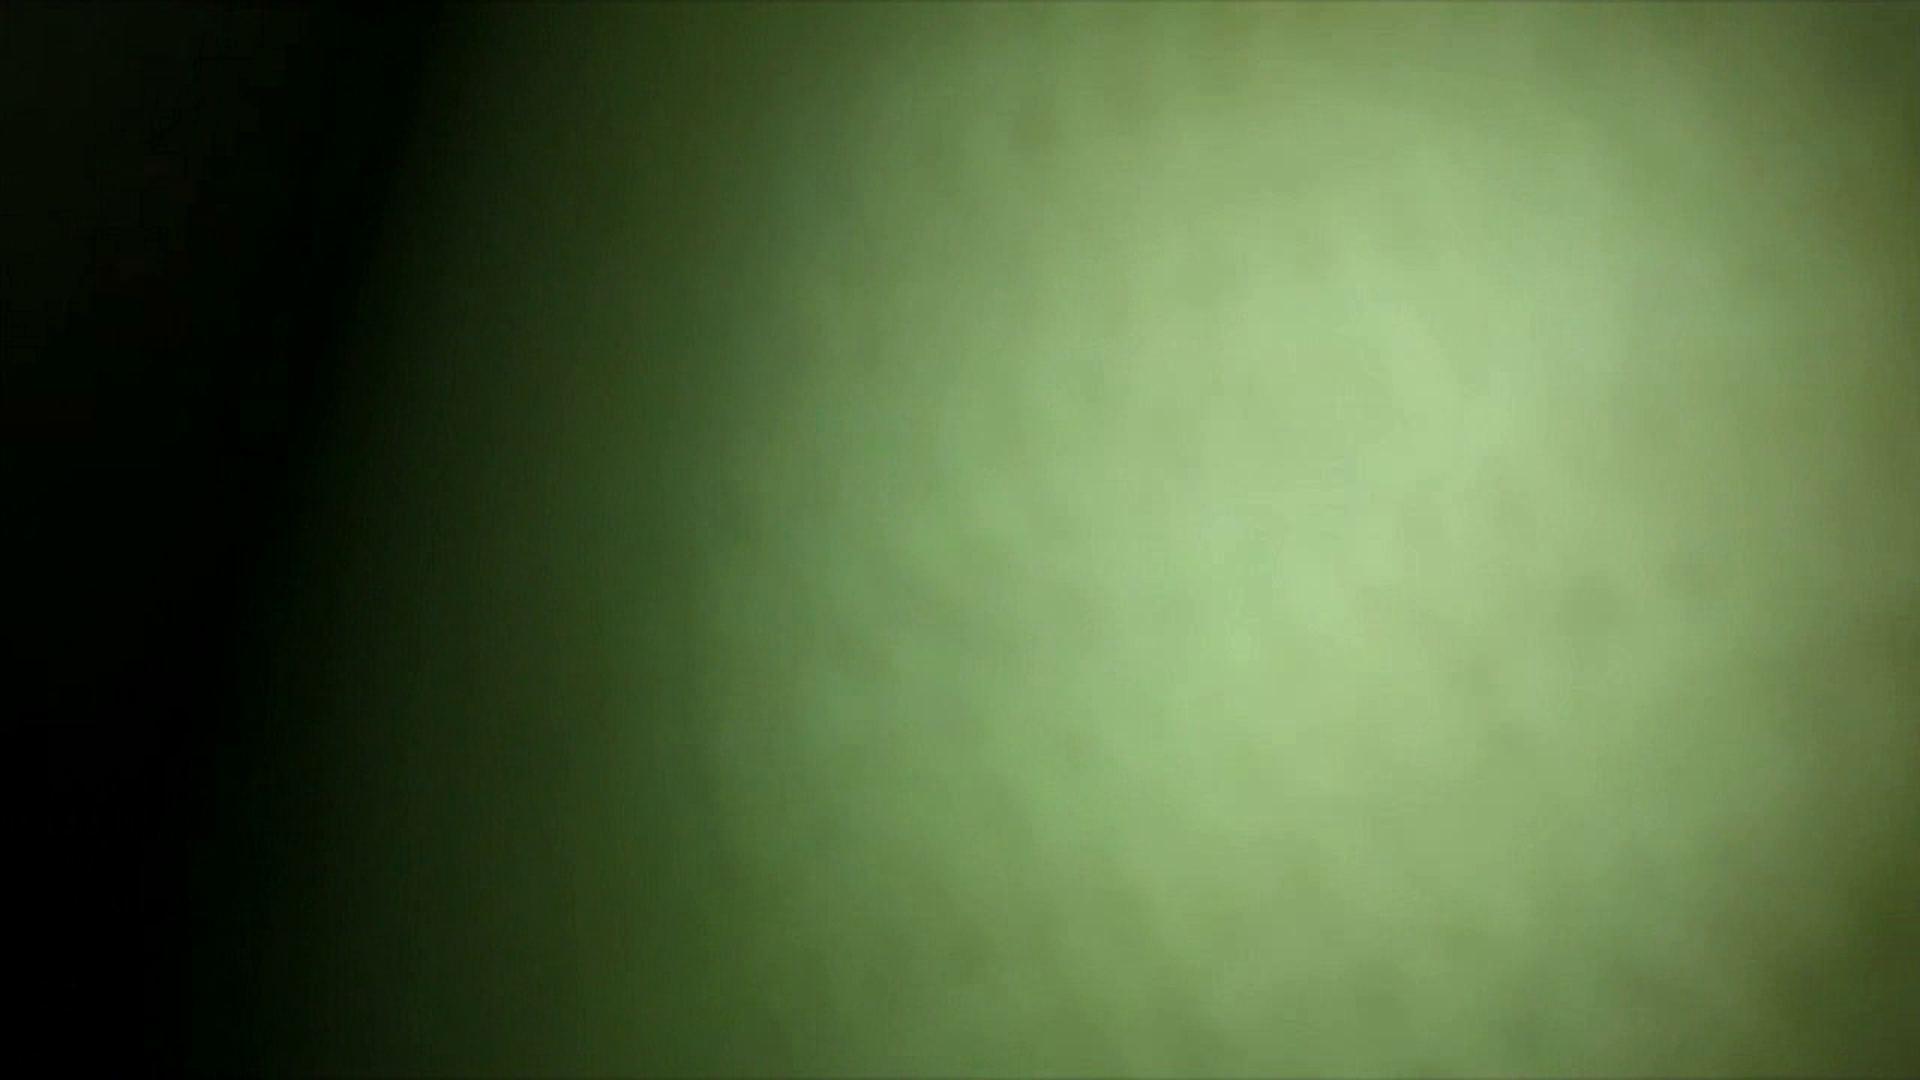 vol.22 【YHちゃん】パルコ店員20歳 mixiオフ会で 女子大生 盗撮AV動画キャプチャ 17pic 3